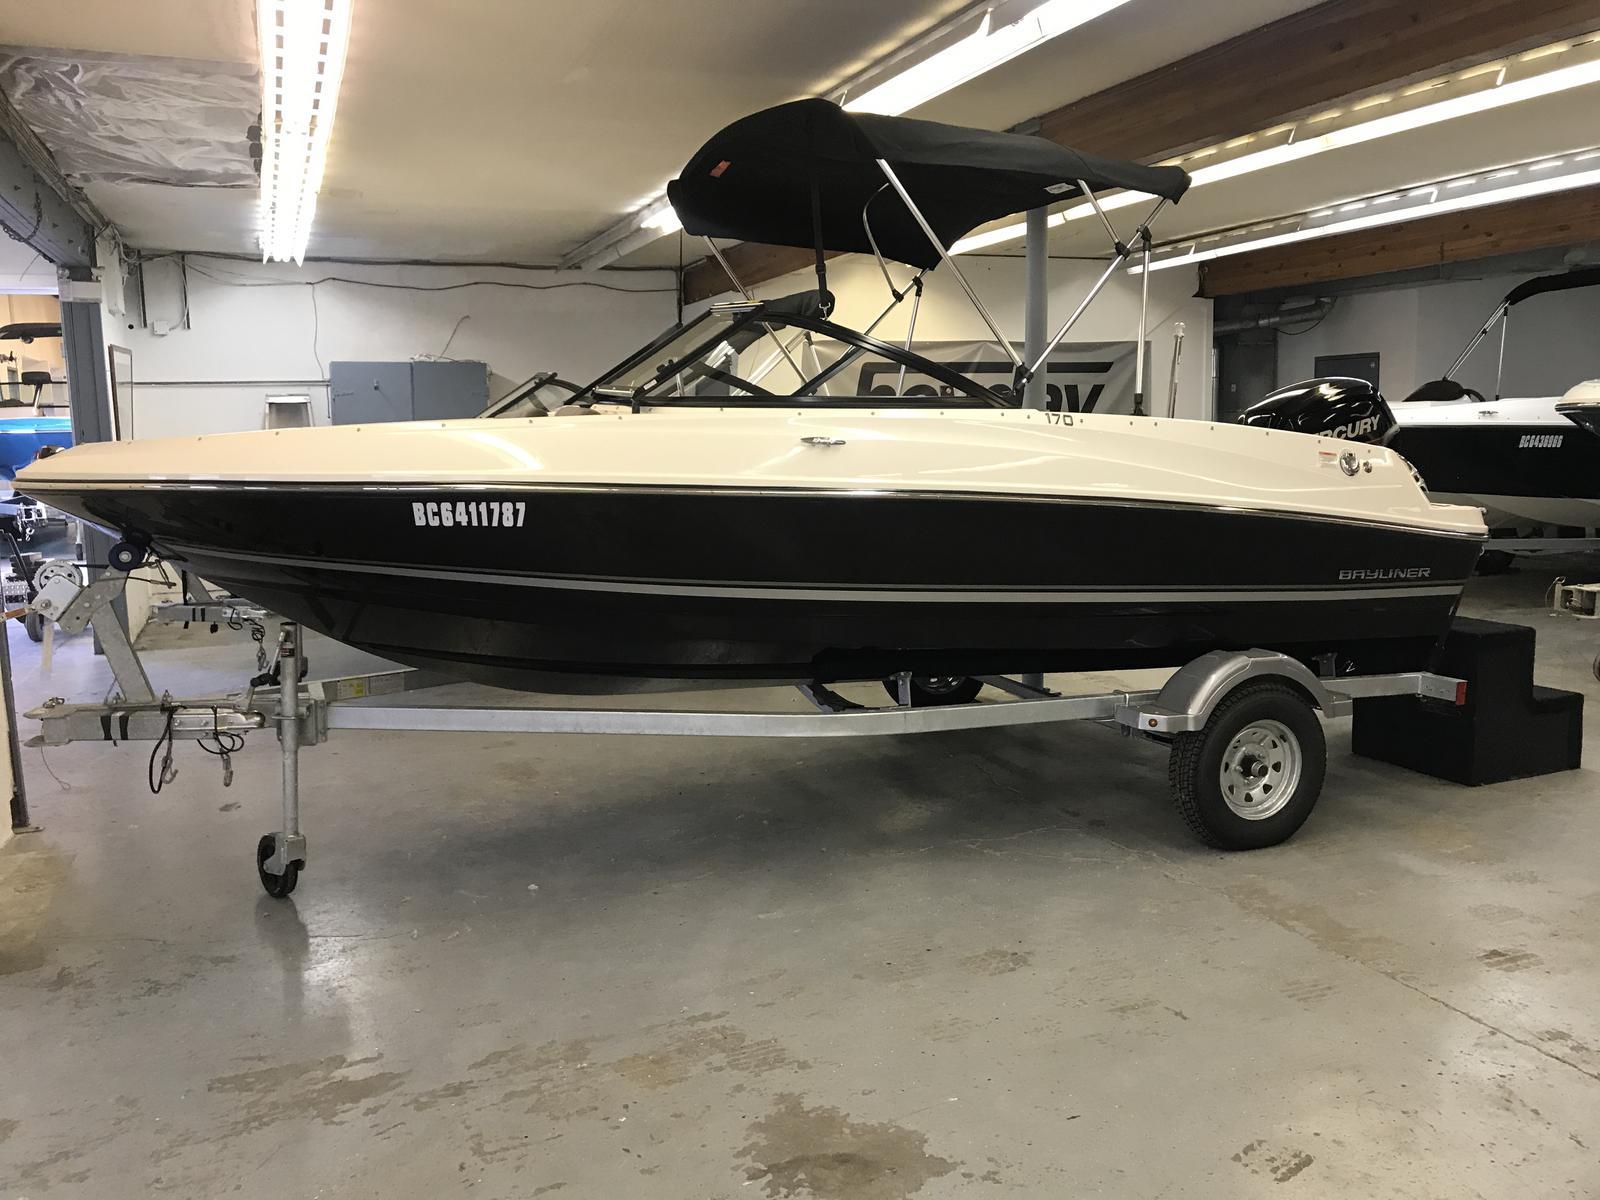 2019 Bayliner boat for sale, model of the boat is 170 Bowrider & Image # 1 of 3